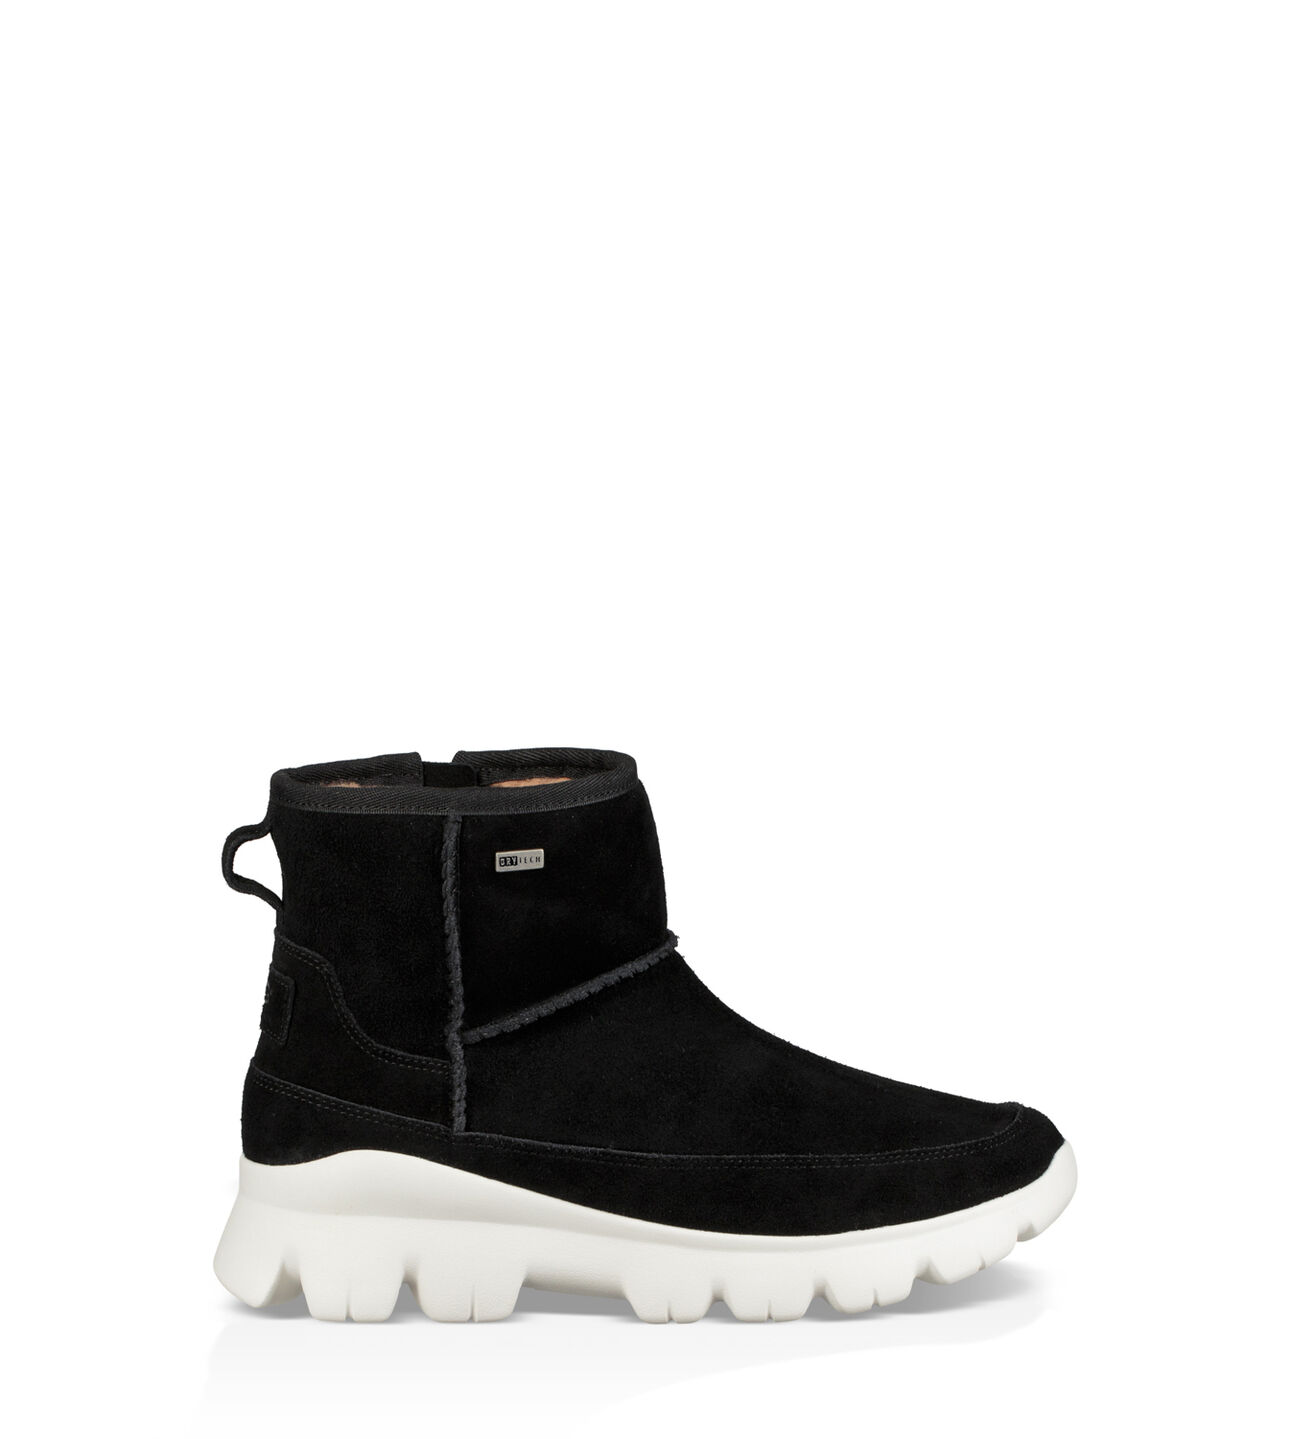 b07d5bfc0fb Palomar Sneaker